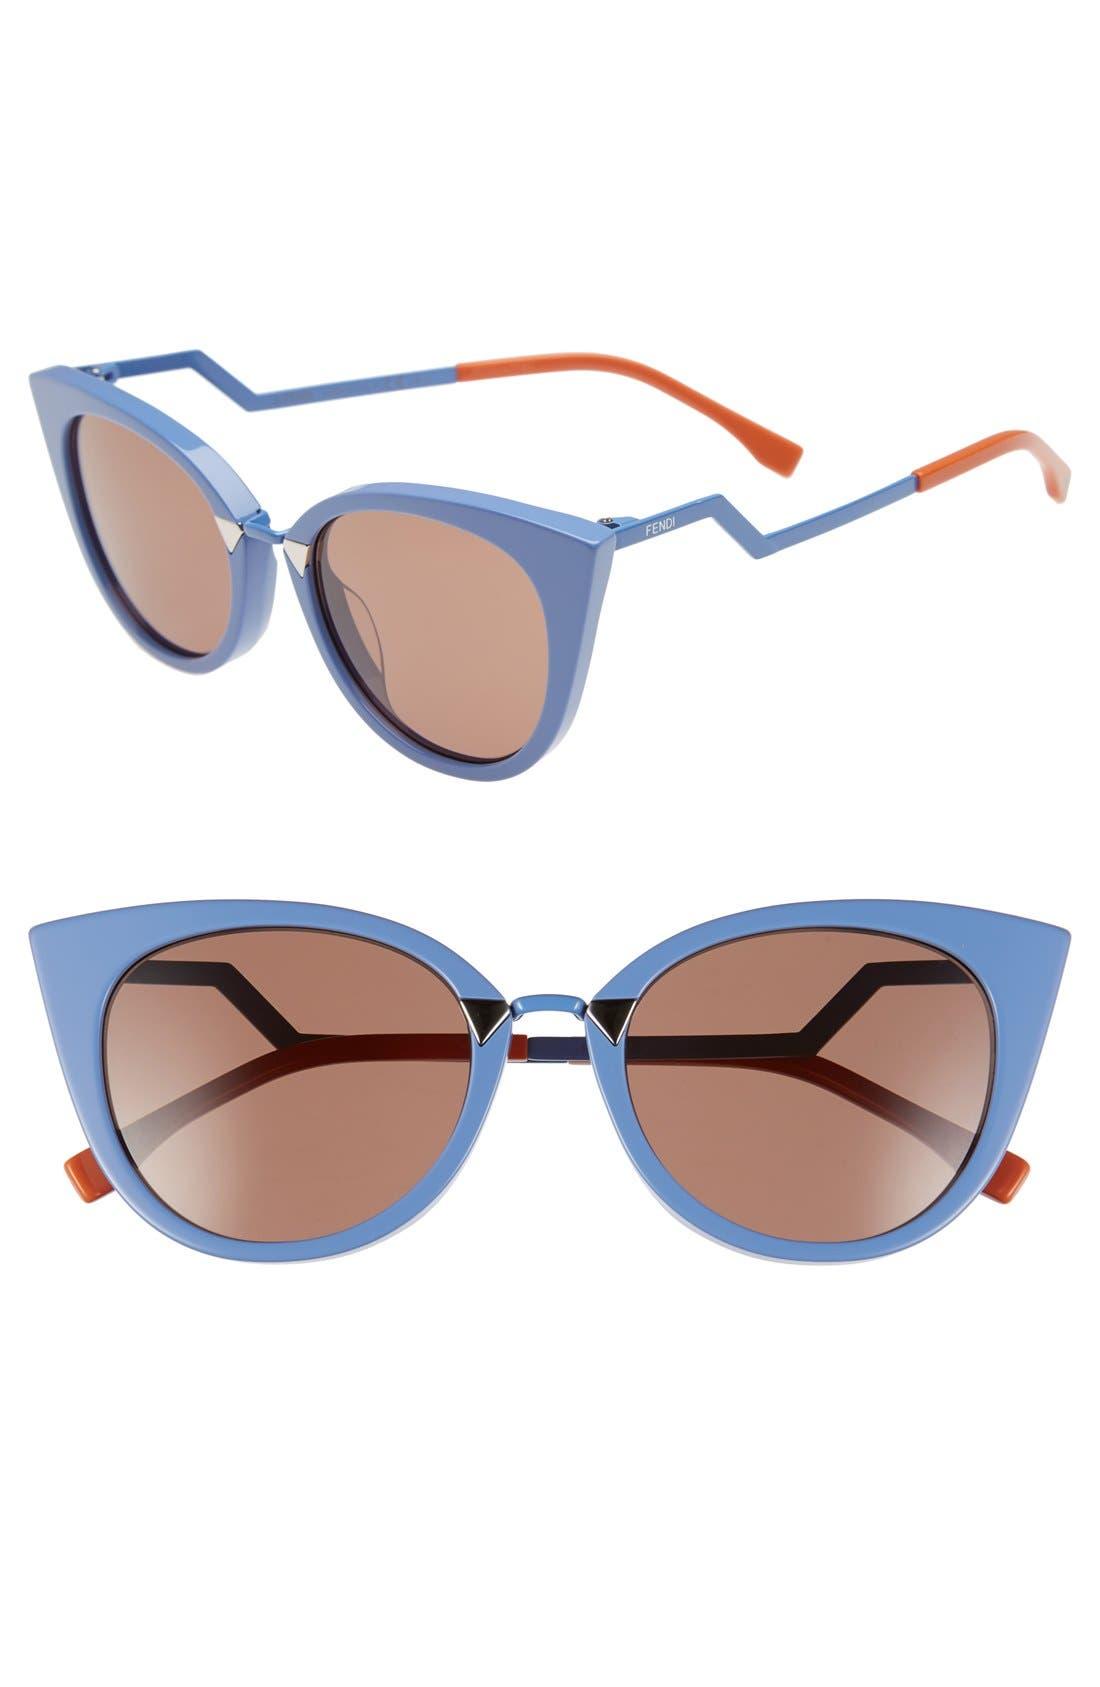 52mm Cat Eye Sunglasses,                             Main thumbnail 4, color,